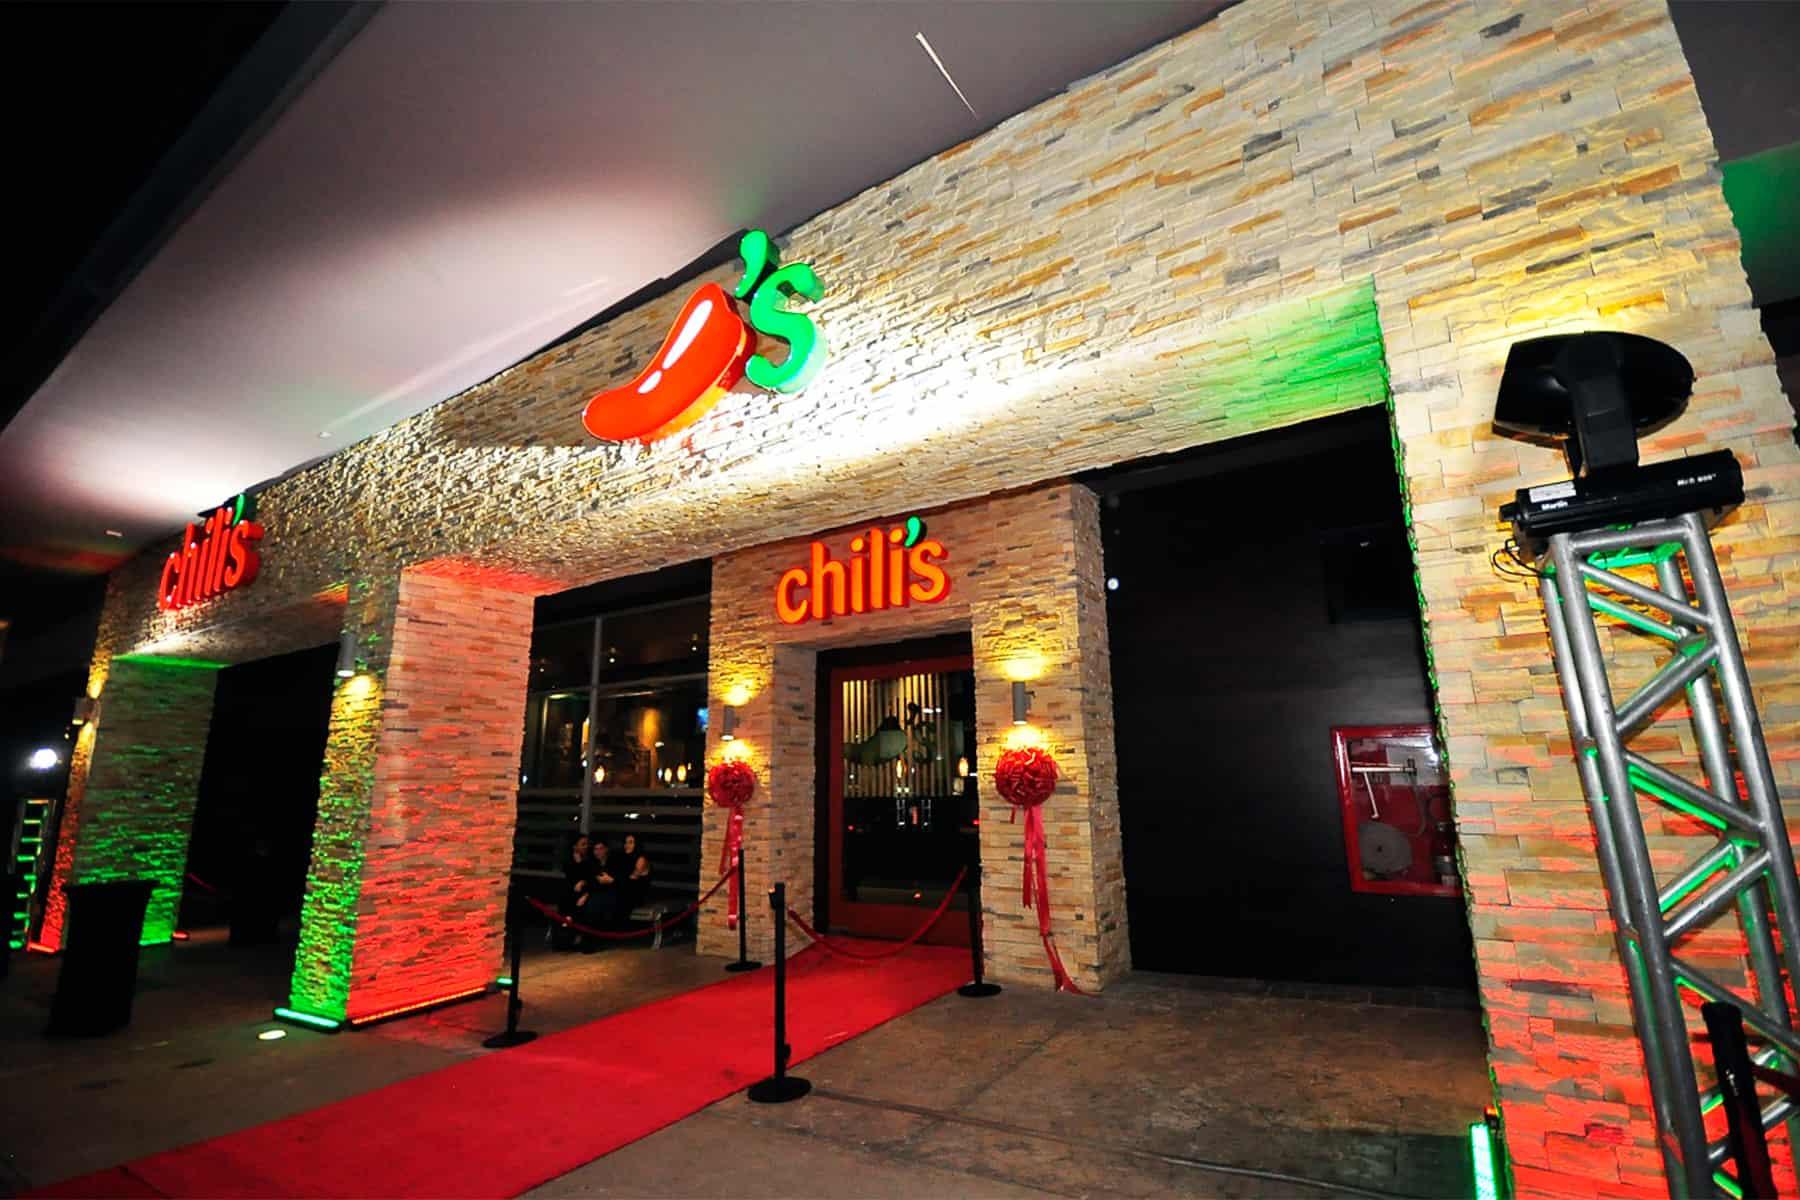 Chili's restaurant at Heredia